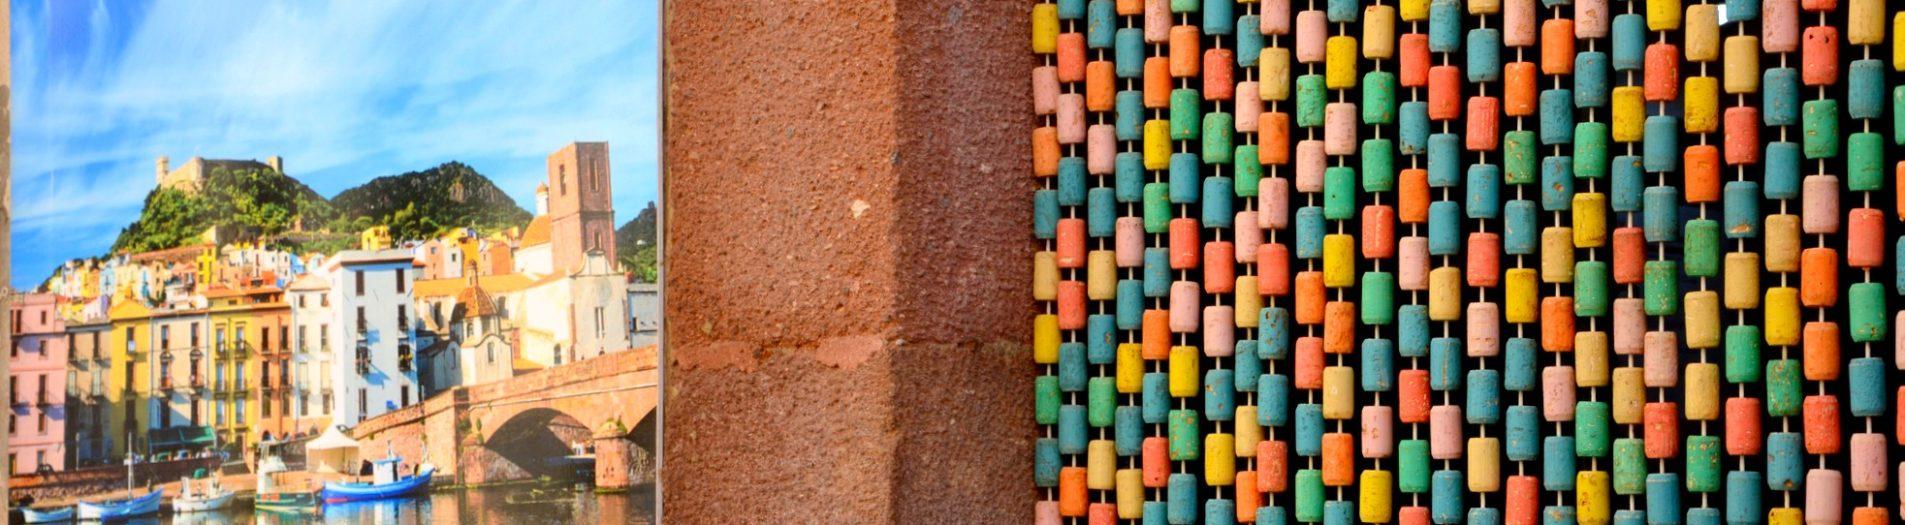 Spreading colors in Bosa